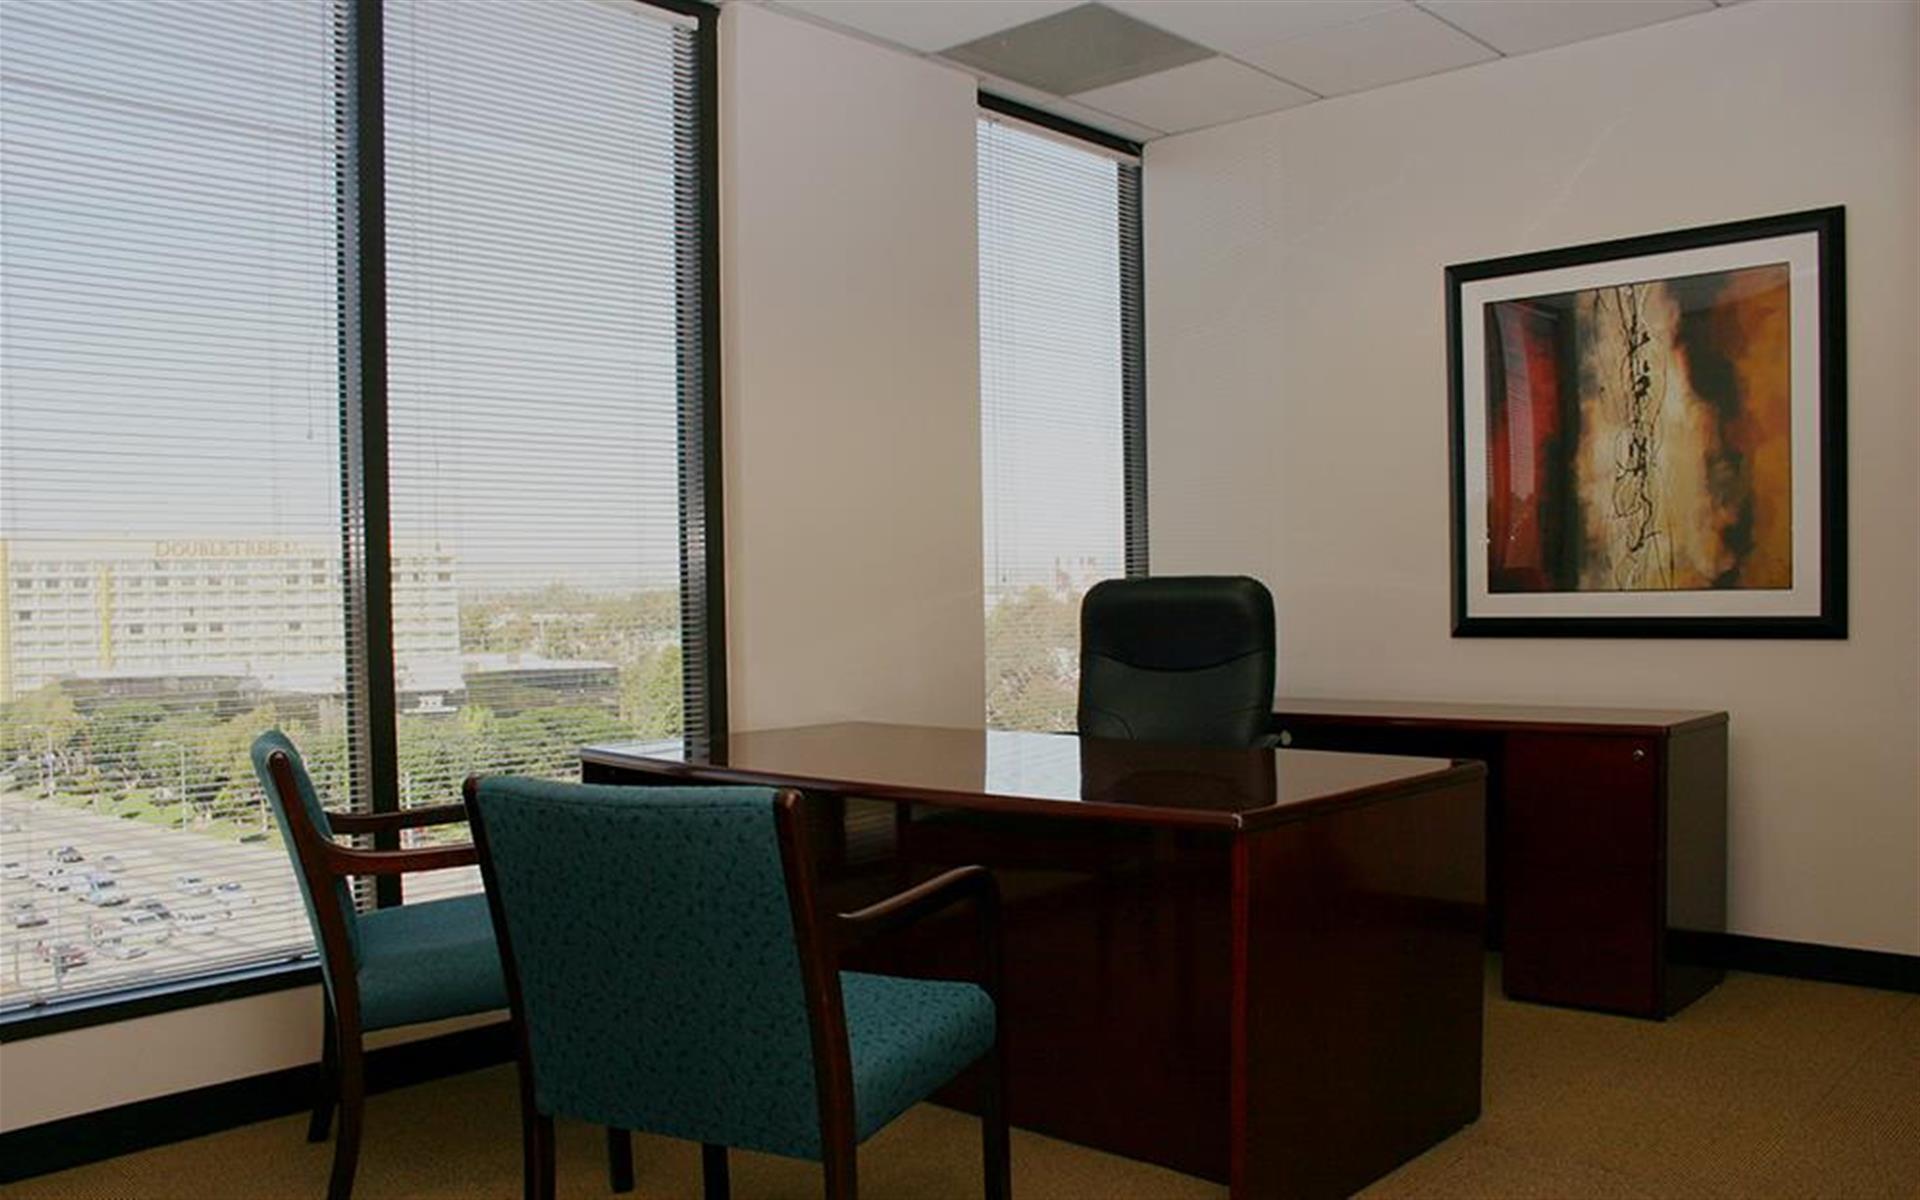 (400) Culver City - 4 office suite